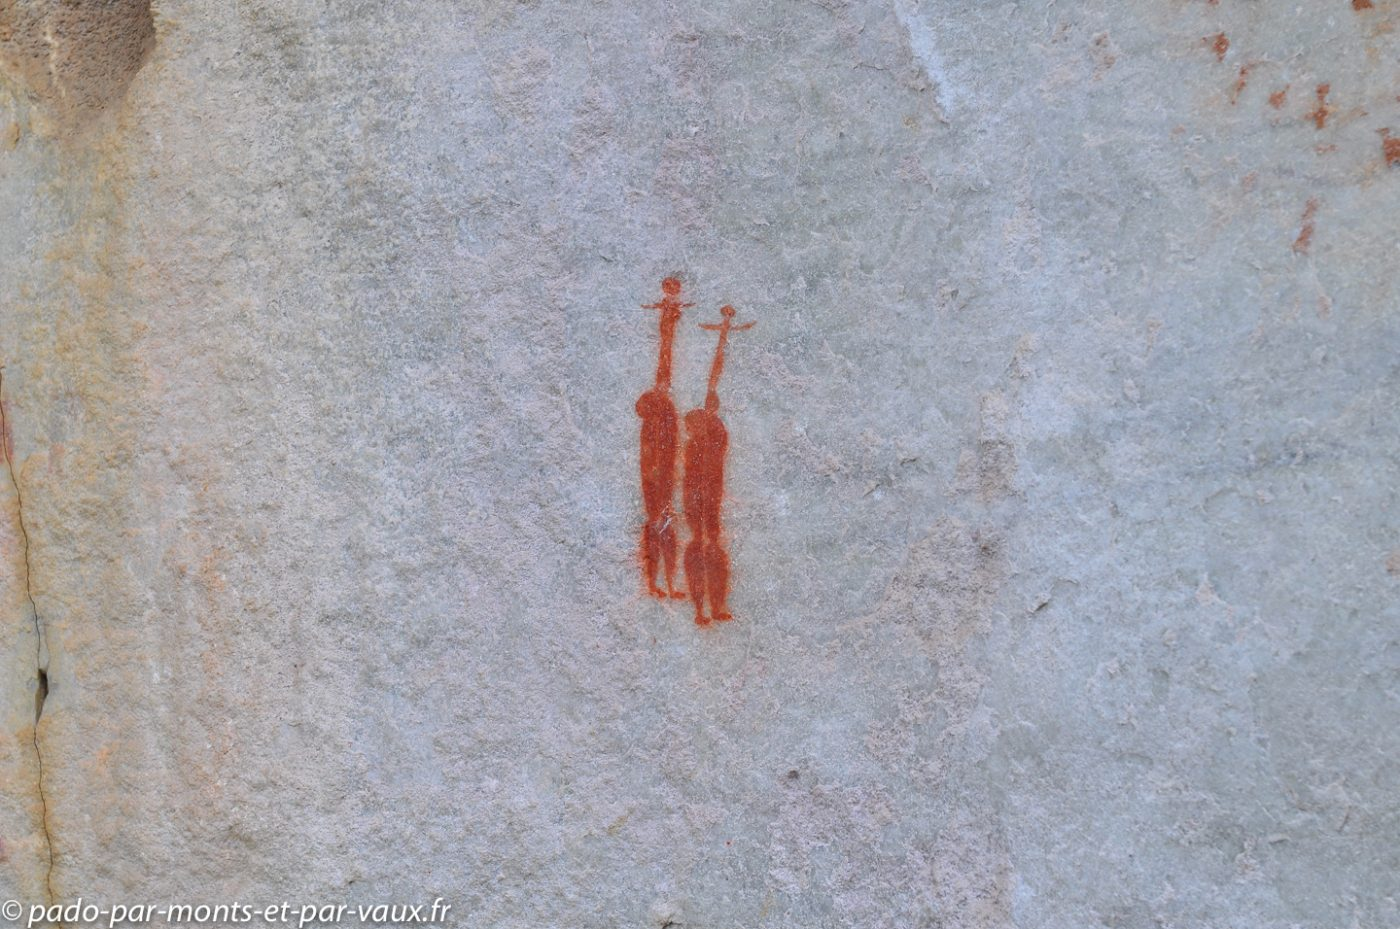 Sevilla Rock Art Trail